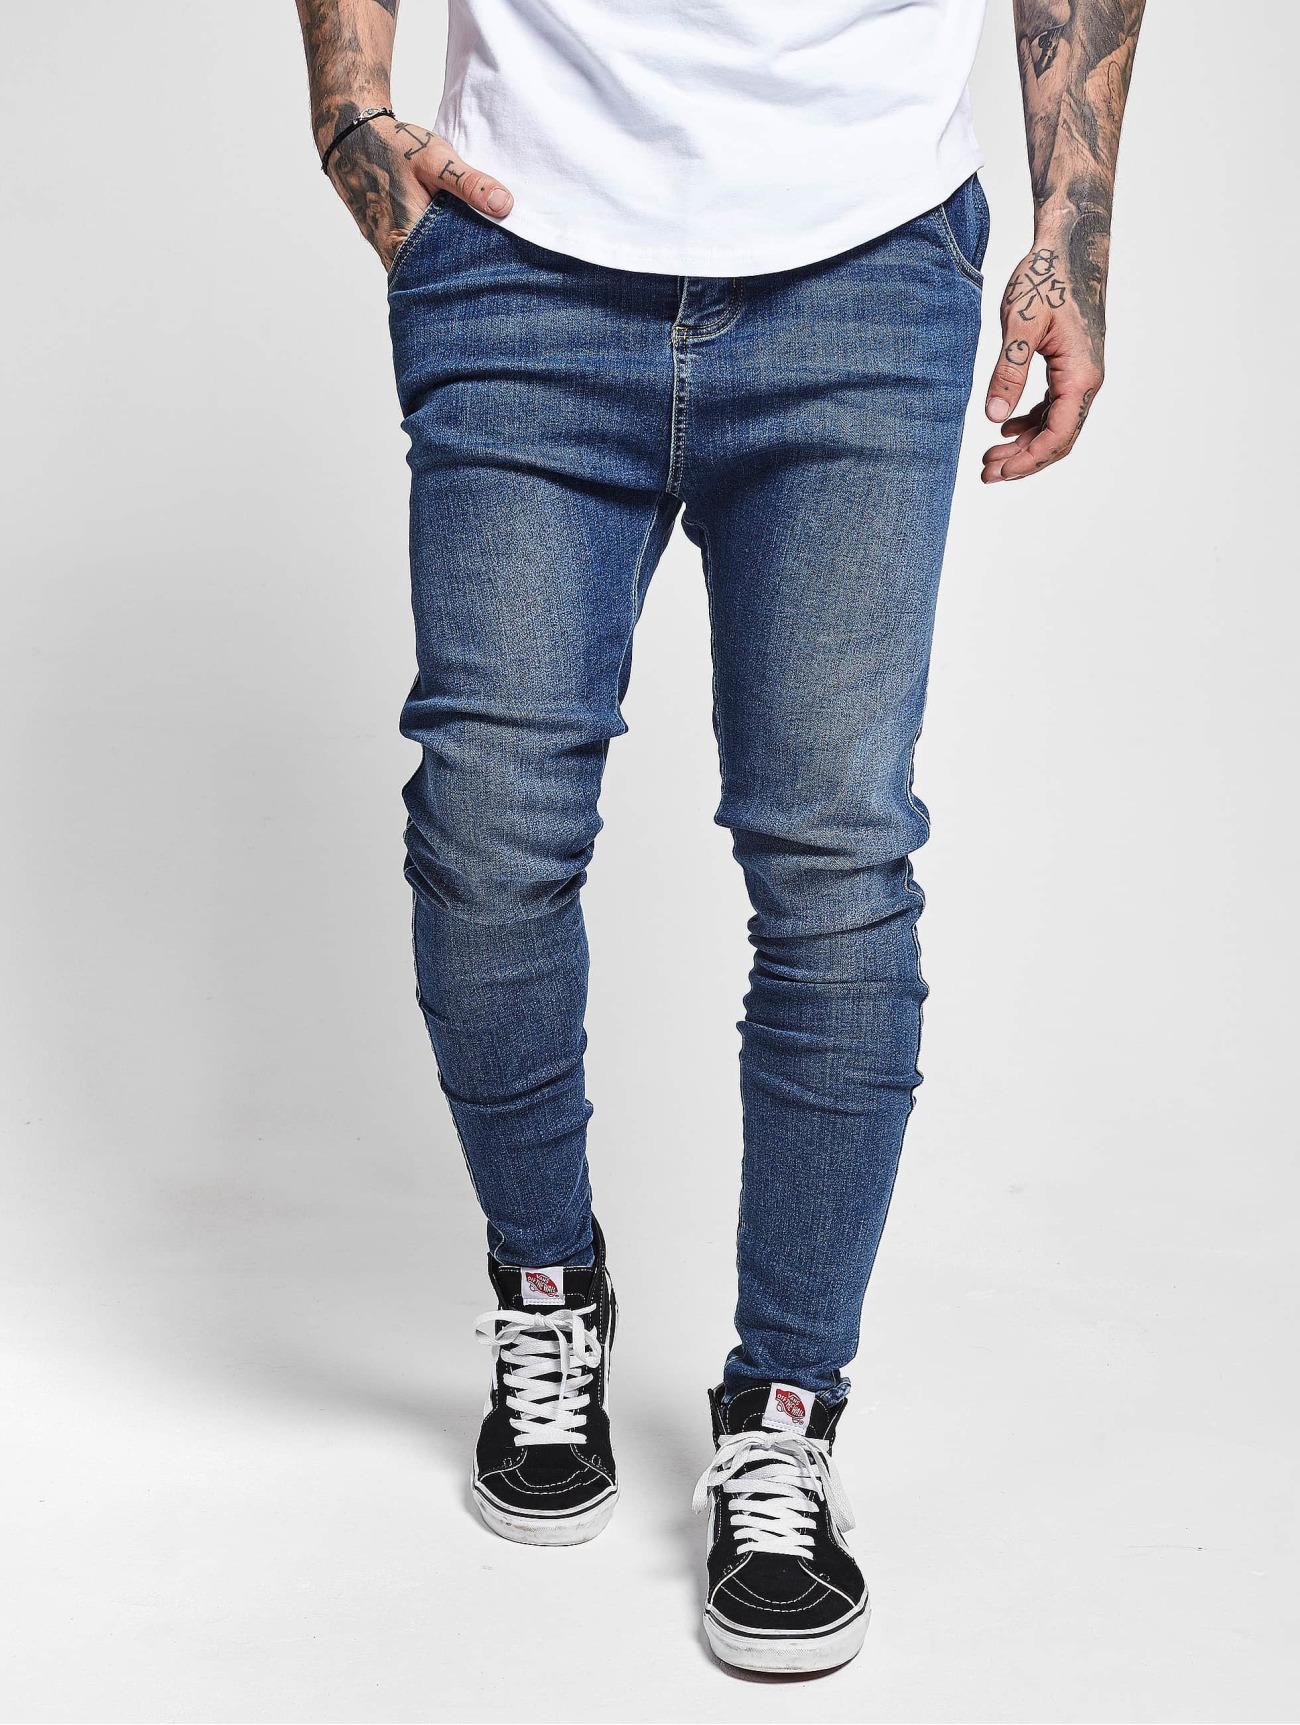 Sik Silk Jeans / Skinny jeans Skinny  i blå 722171 Män Jeans